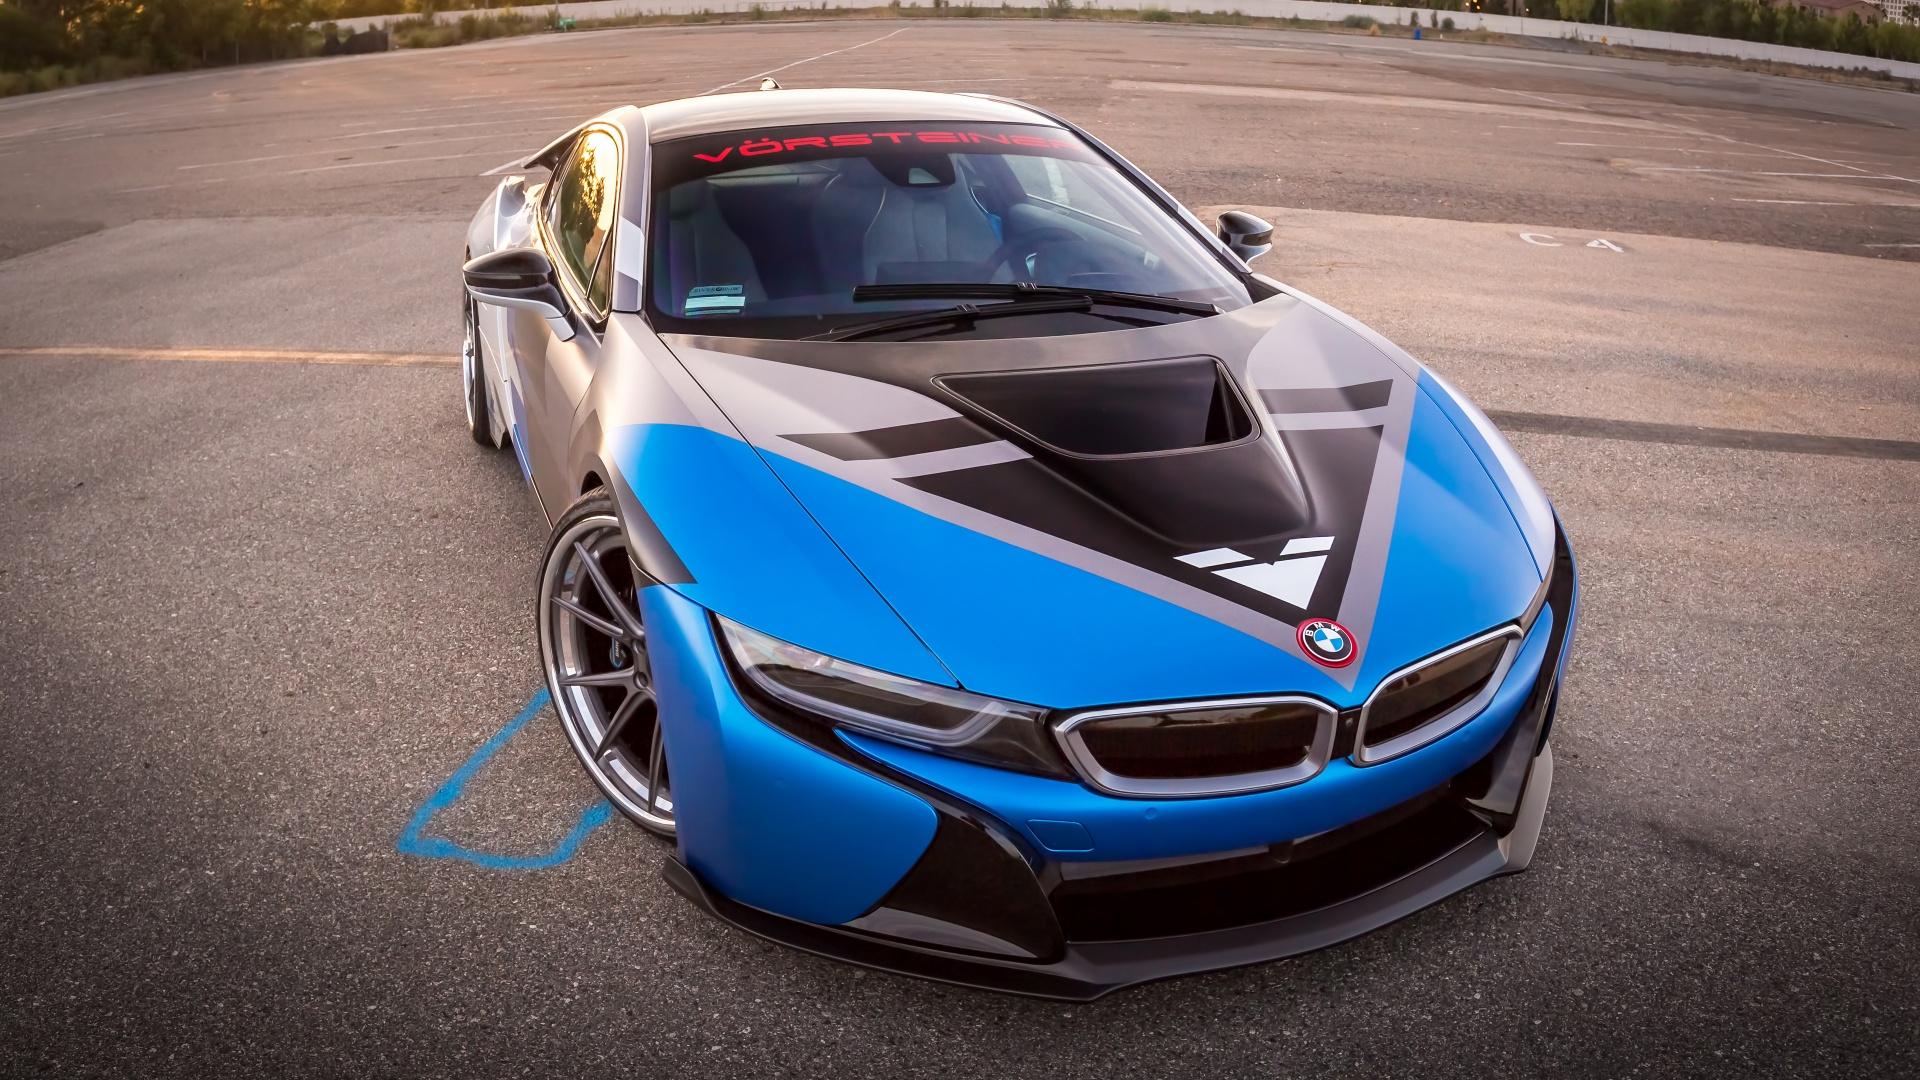 Fondos de BMW, Wallpapers HD Gratis